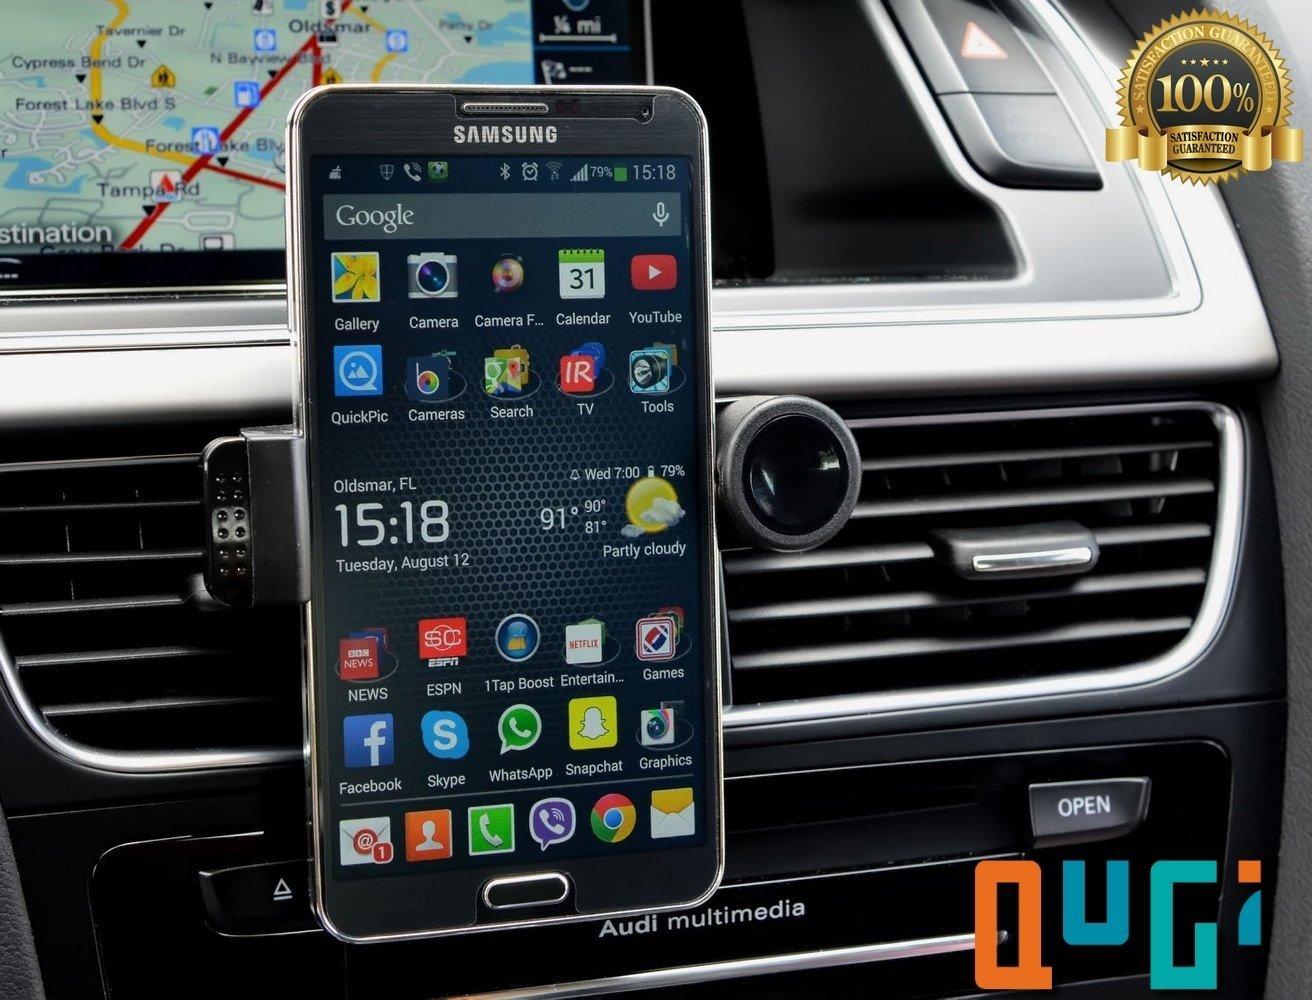 iphone holder for car. qugi iphone holder for car